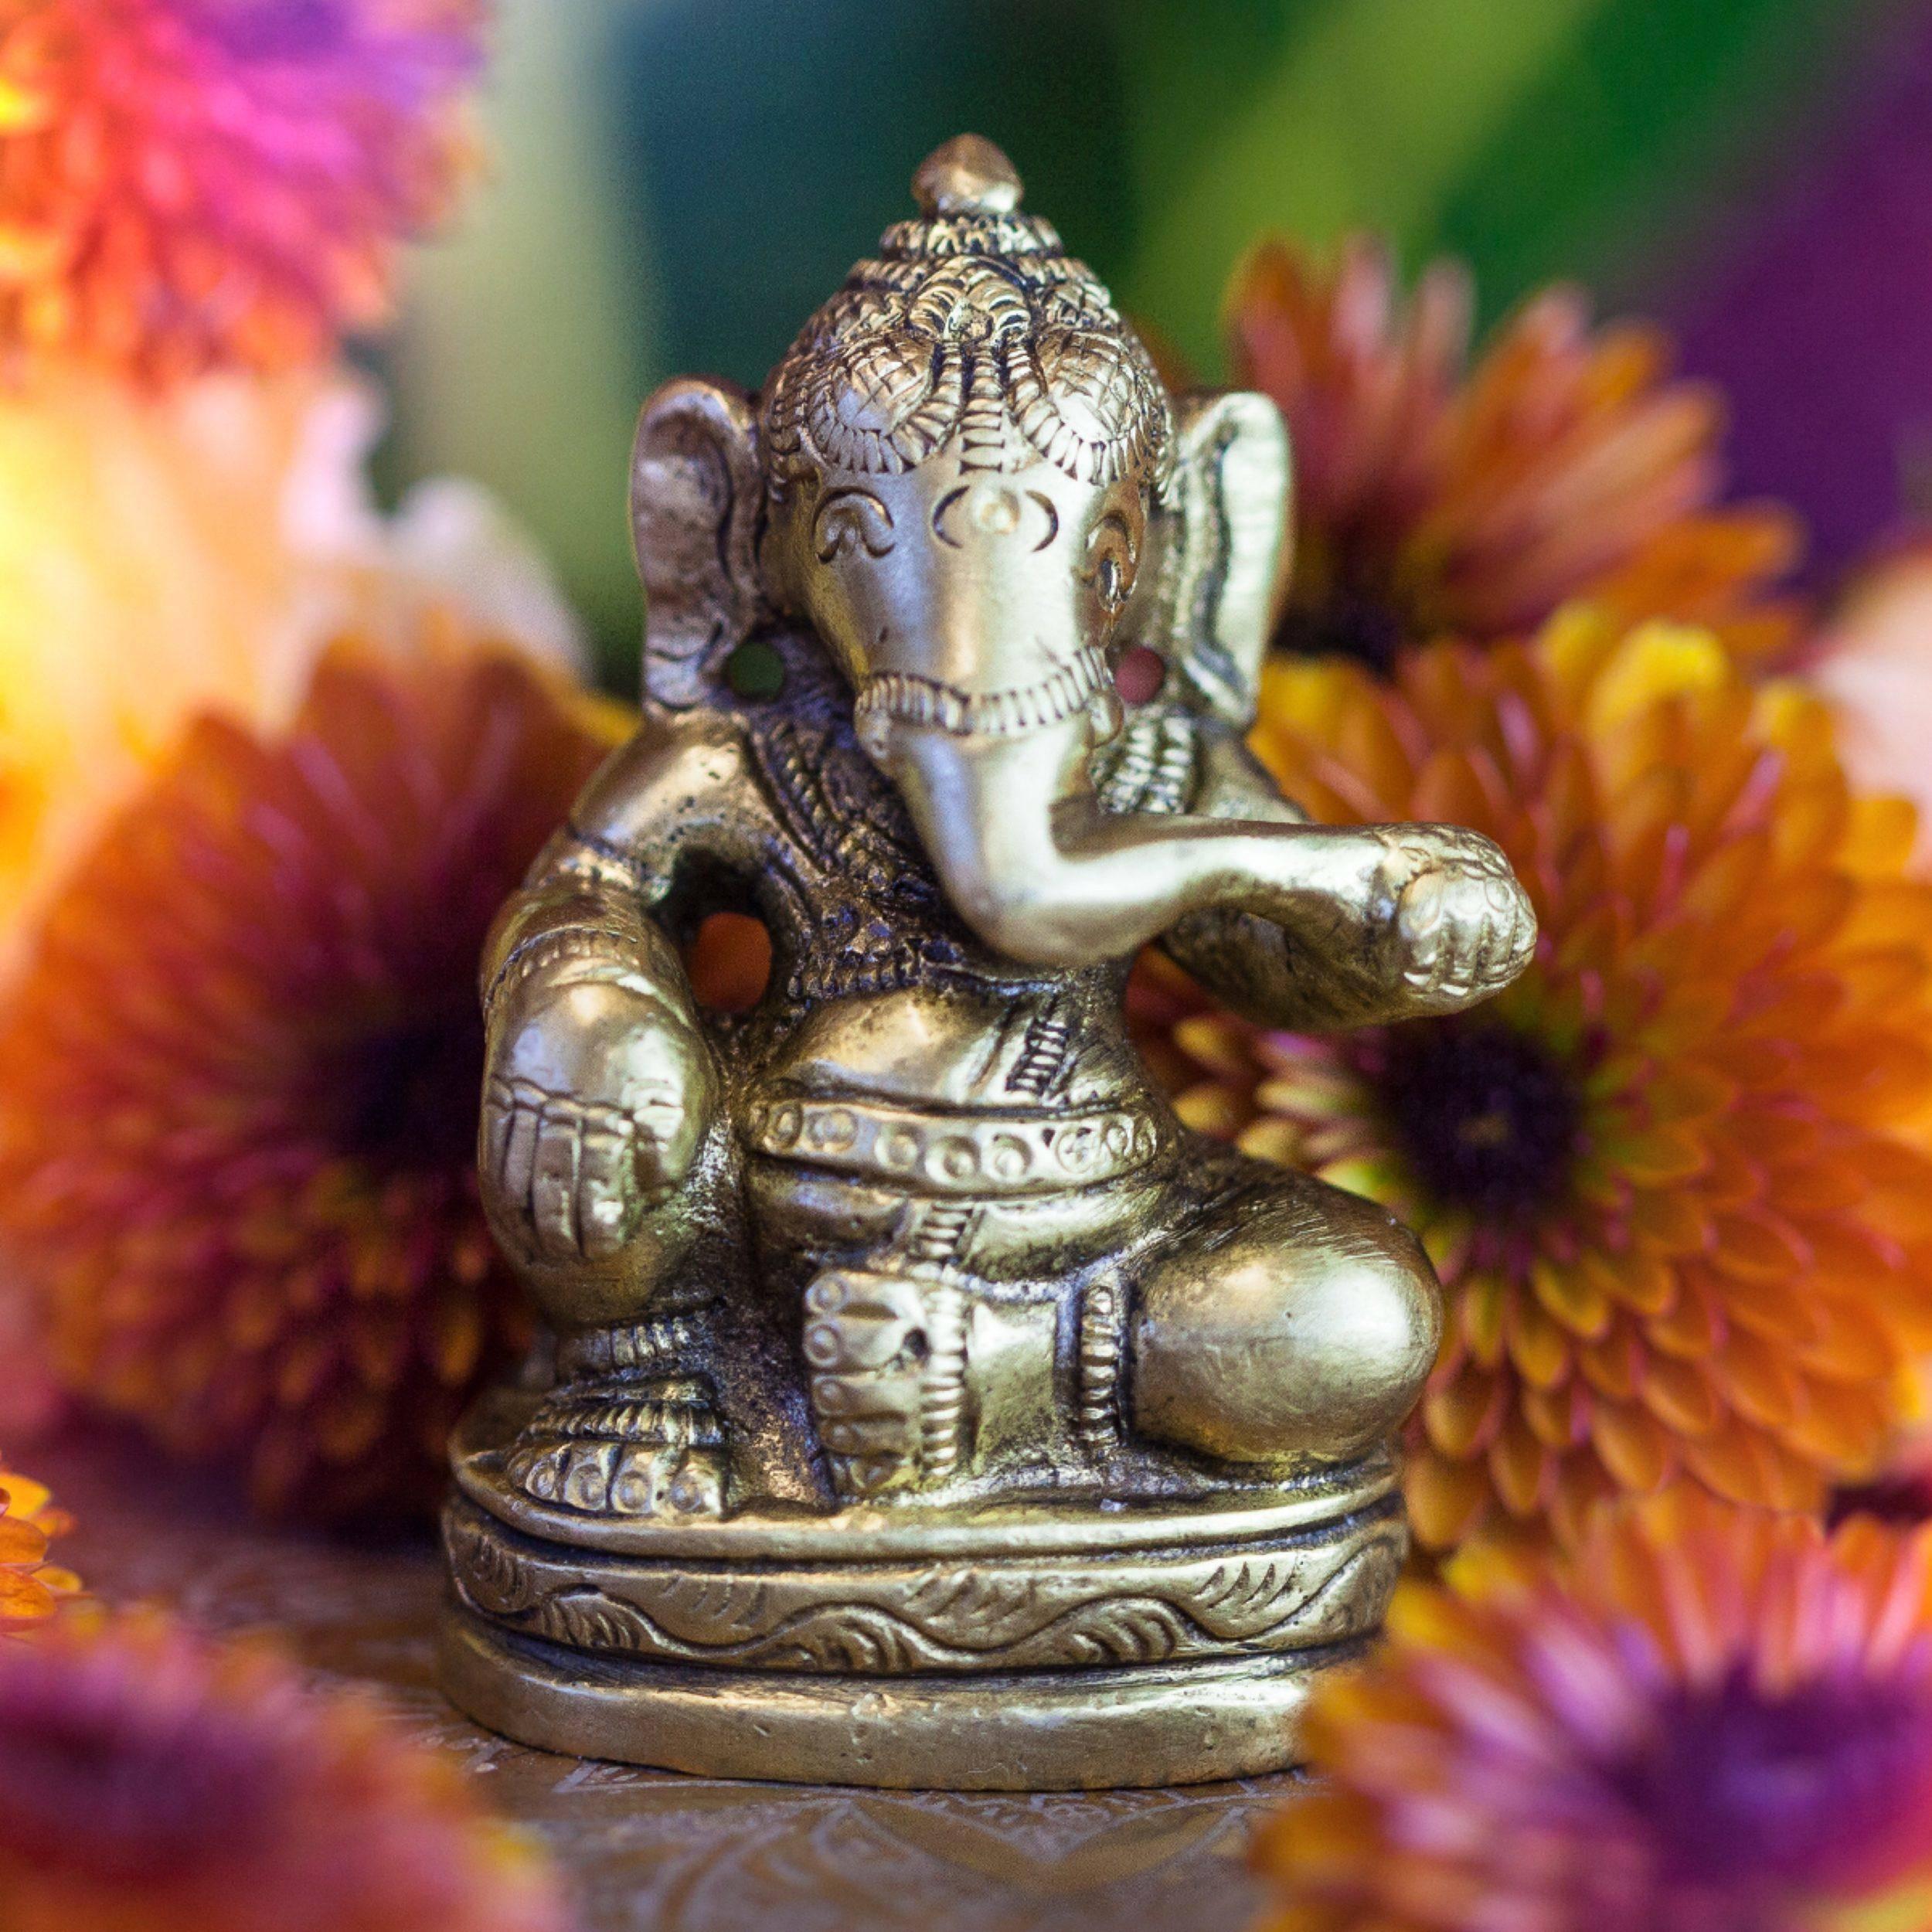 Brass_Ganesha_Statuette_1of3_11_13